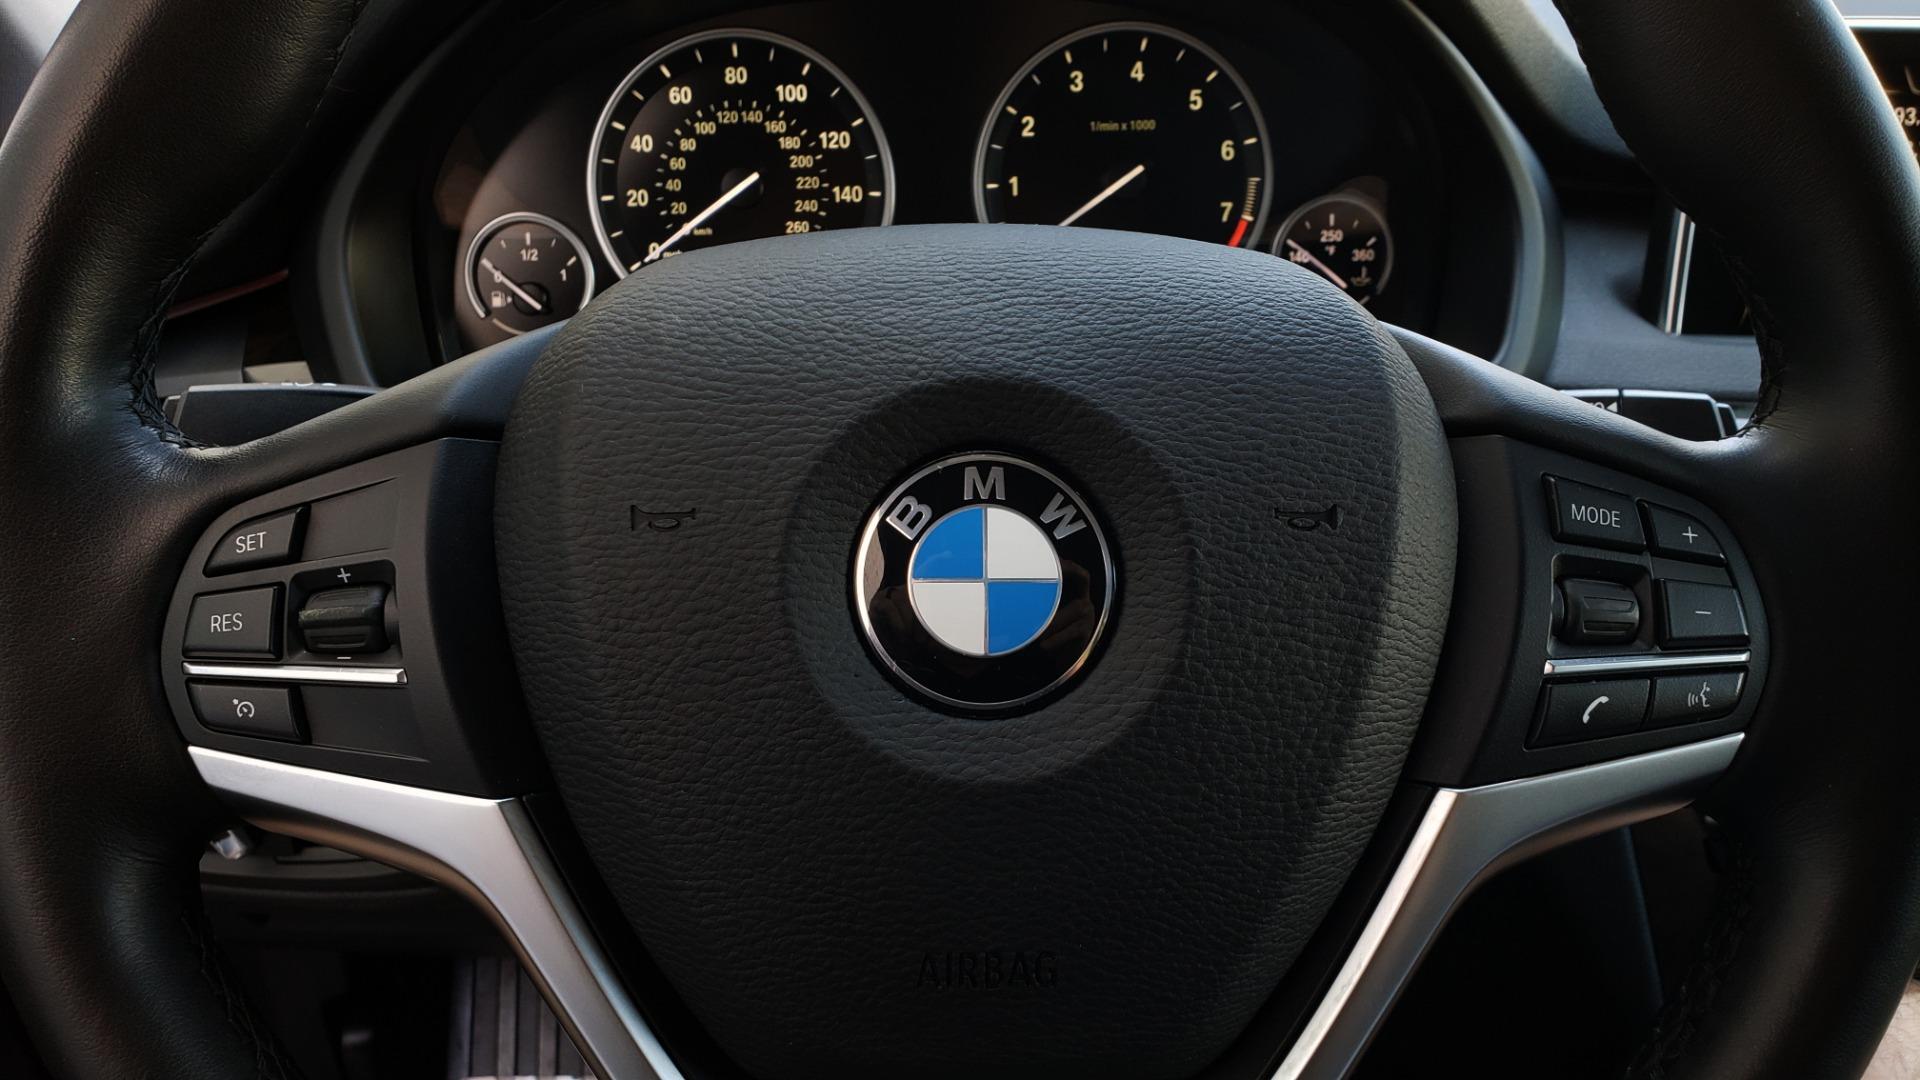 Used 2016 BMW X5 XDRIVE35I / PREM PKG / NAV / DRVR ASST PLUS / REARVIEW for sale $25,765 at Formula Imports in Charlotte NC 28227 28